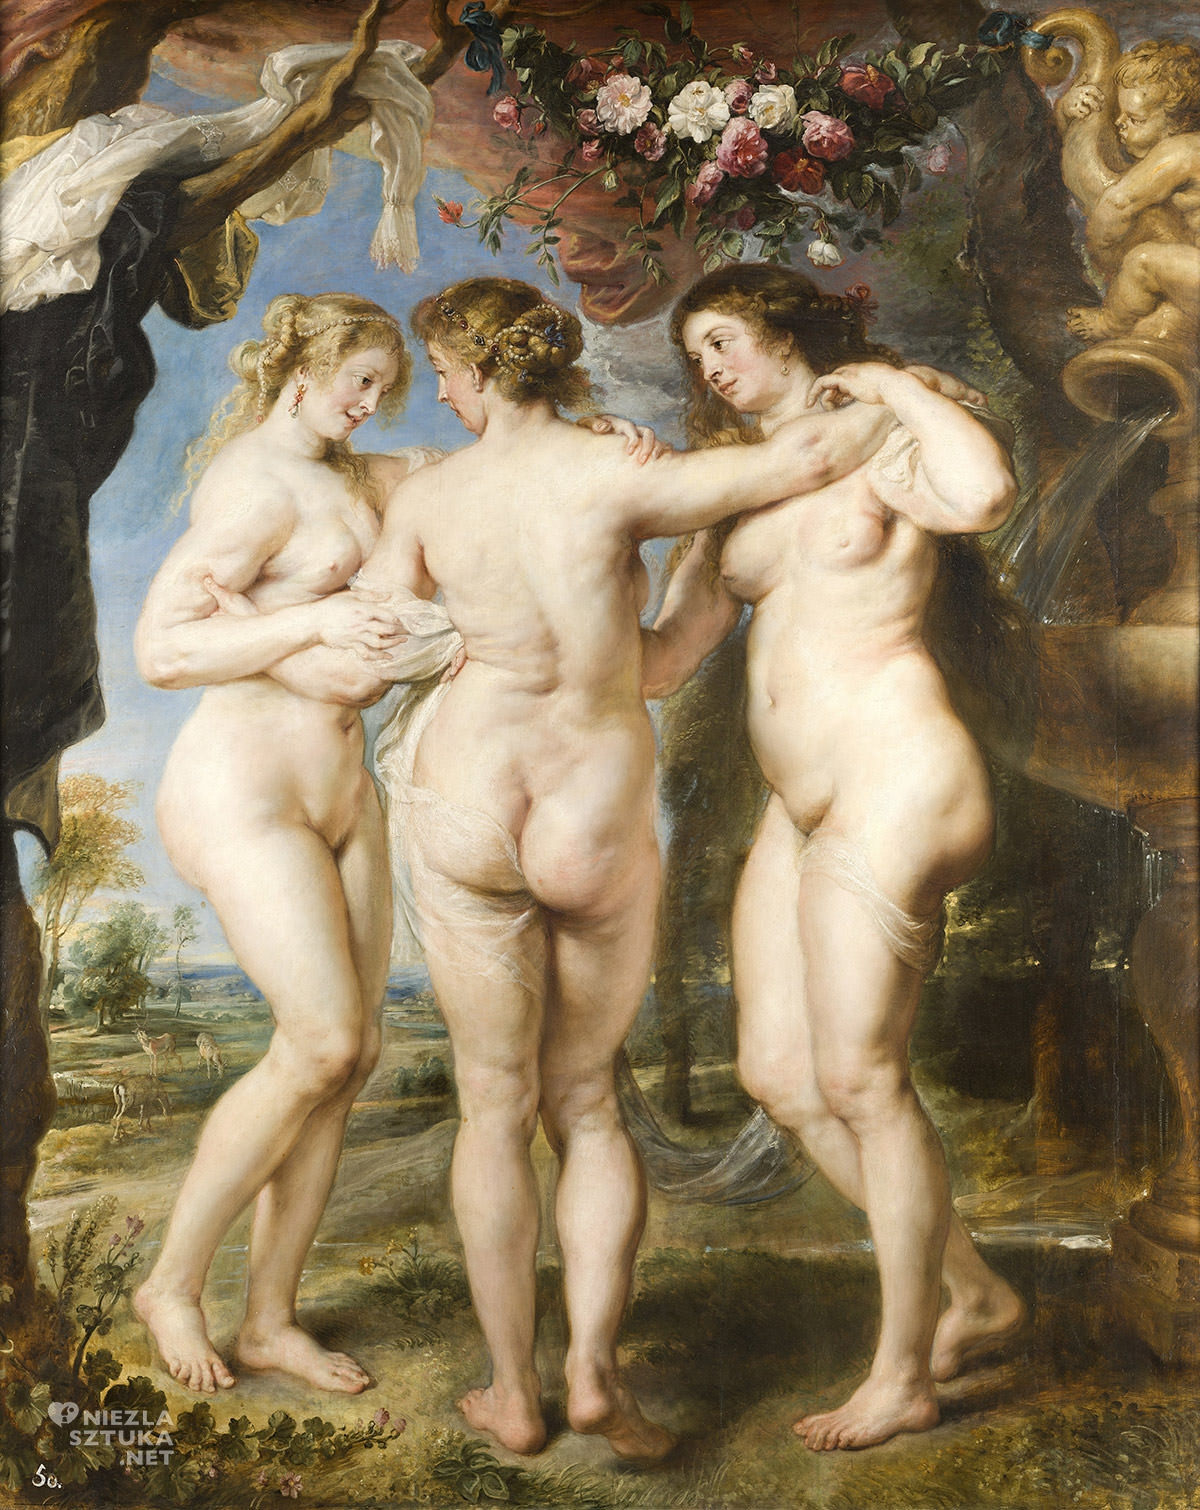 Peter Paul Rubens, Trzy Gracje, sztuka flamandzka, Niezła sztuka